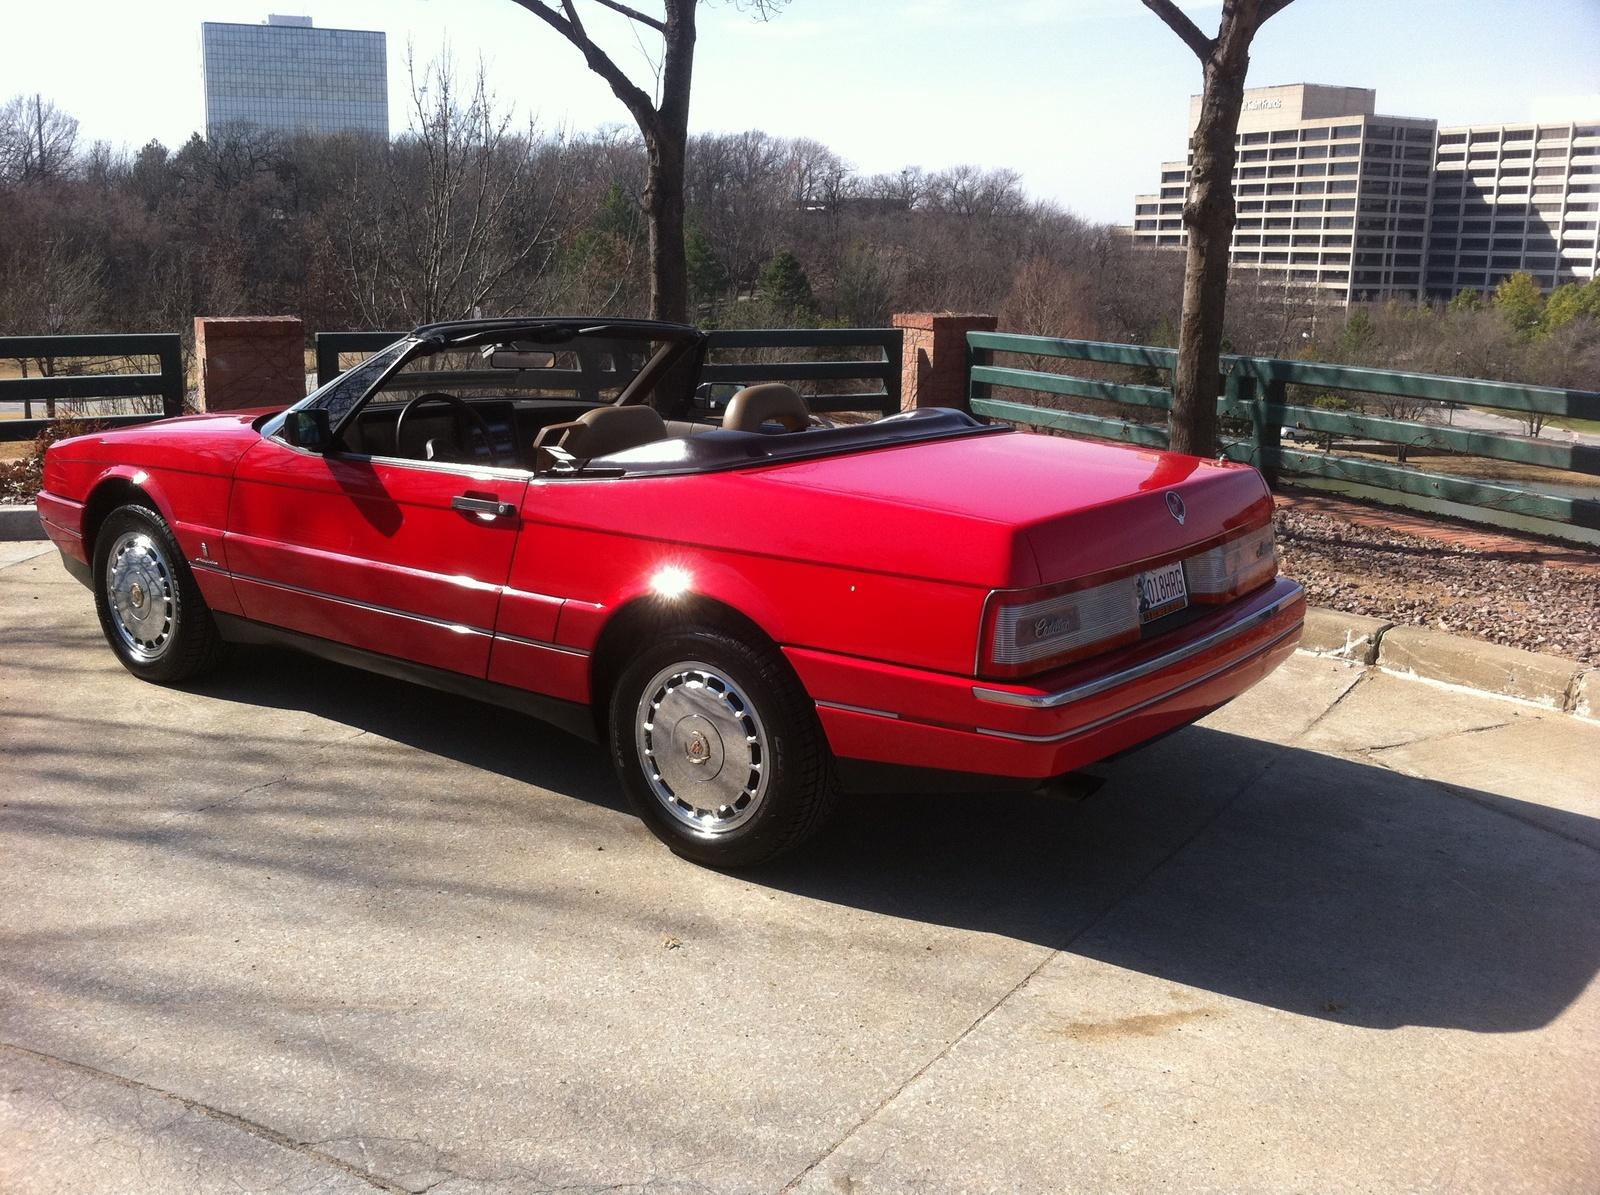 1990 Cadillac Allante - Overview - CarGurus